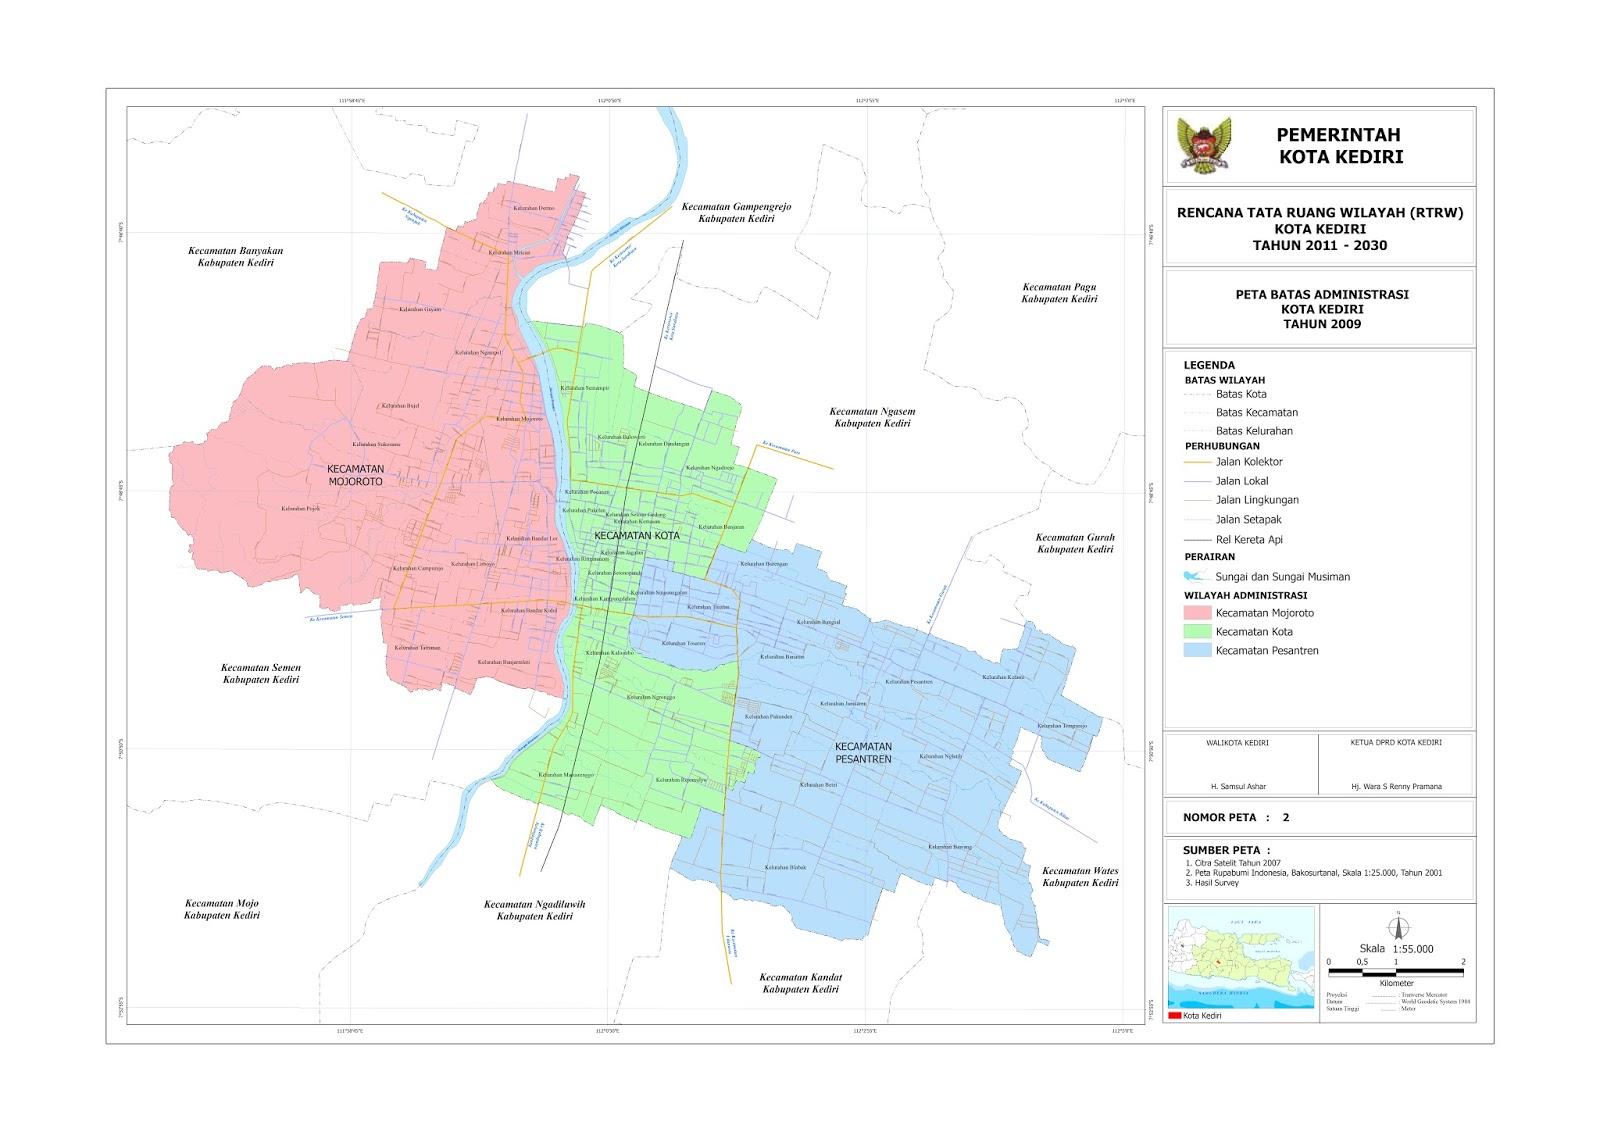 Profil Kota Kediri